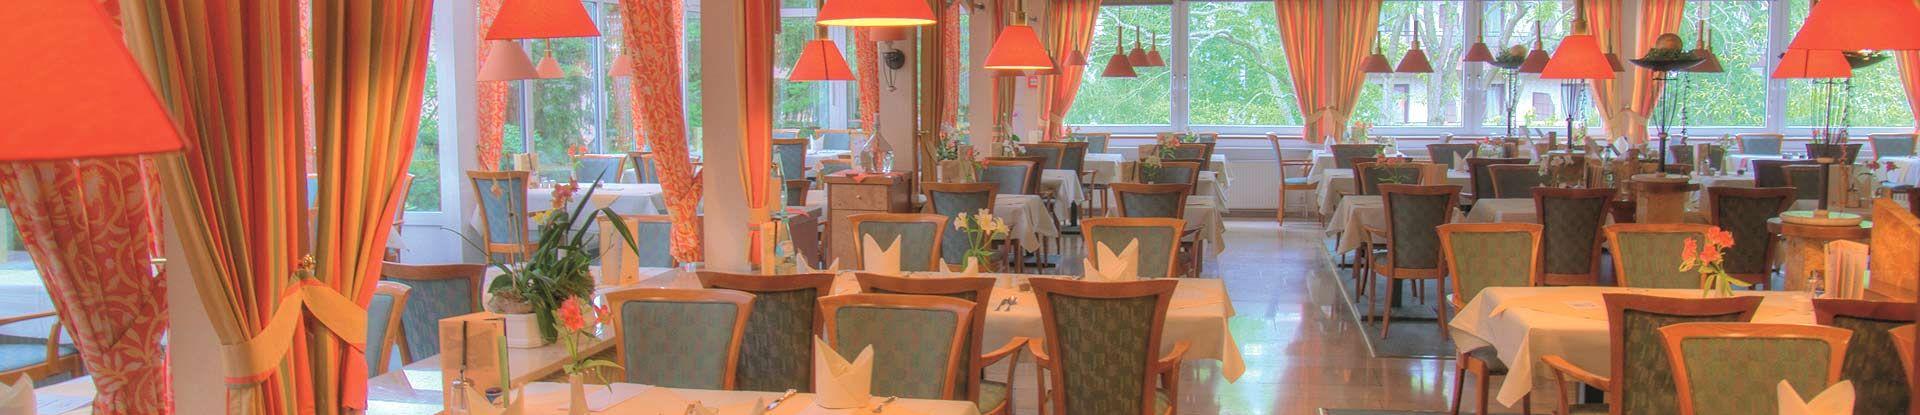 Restaurant VitalHotel Ascona in Bad Bevensen